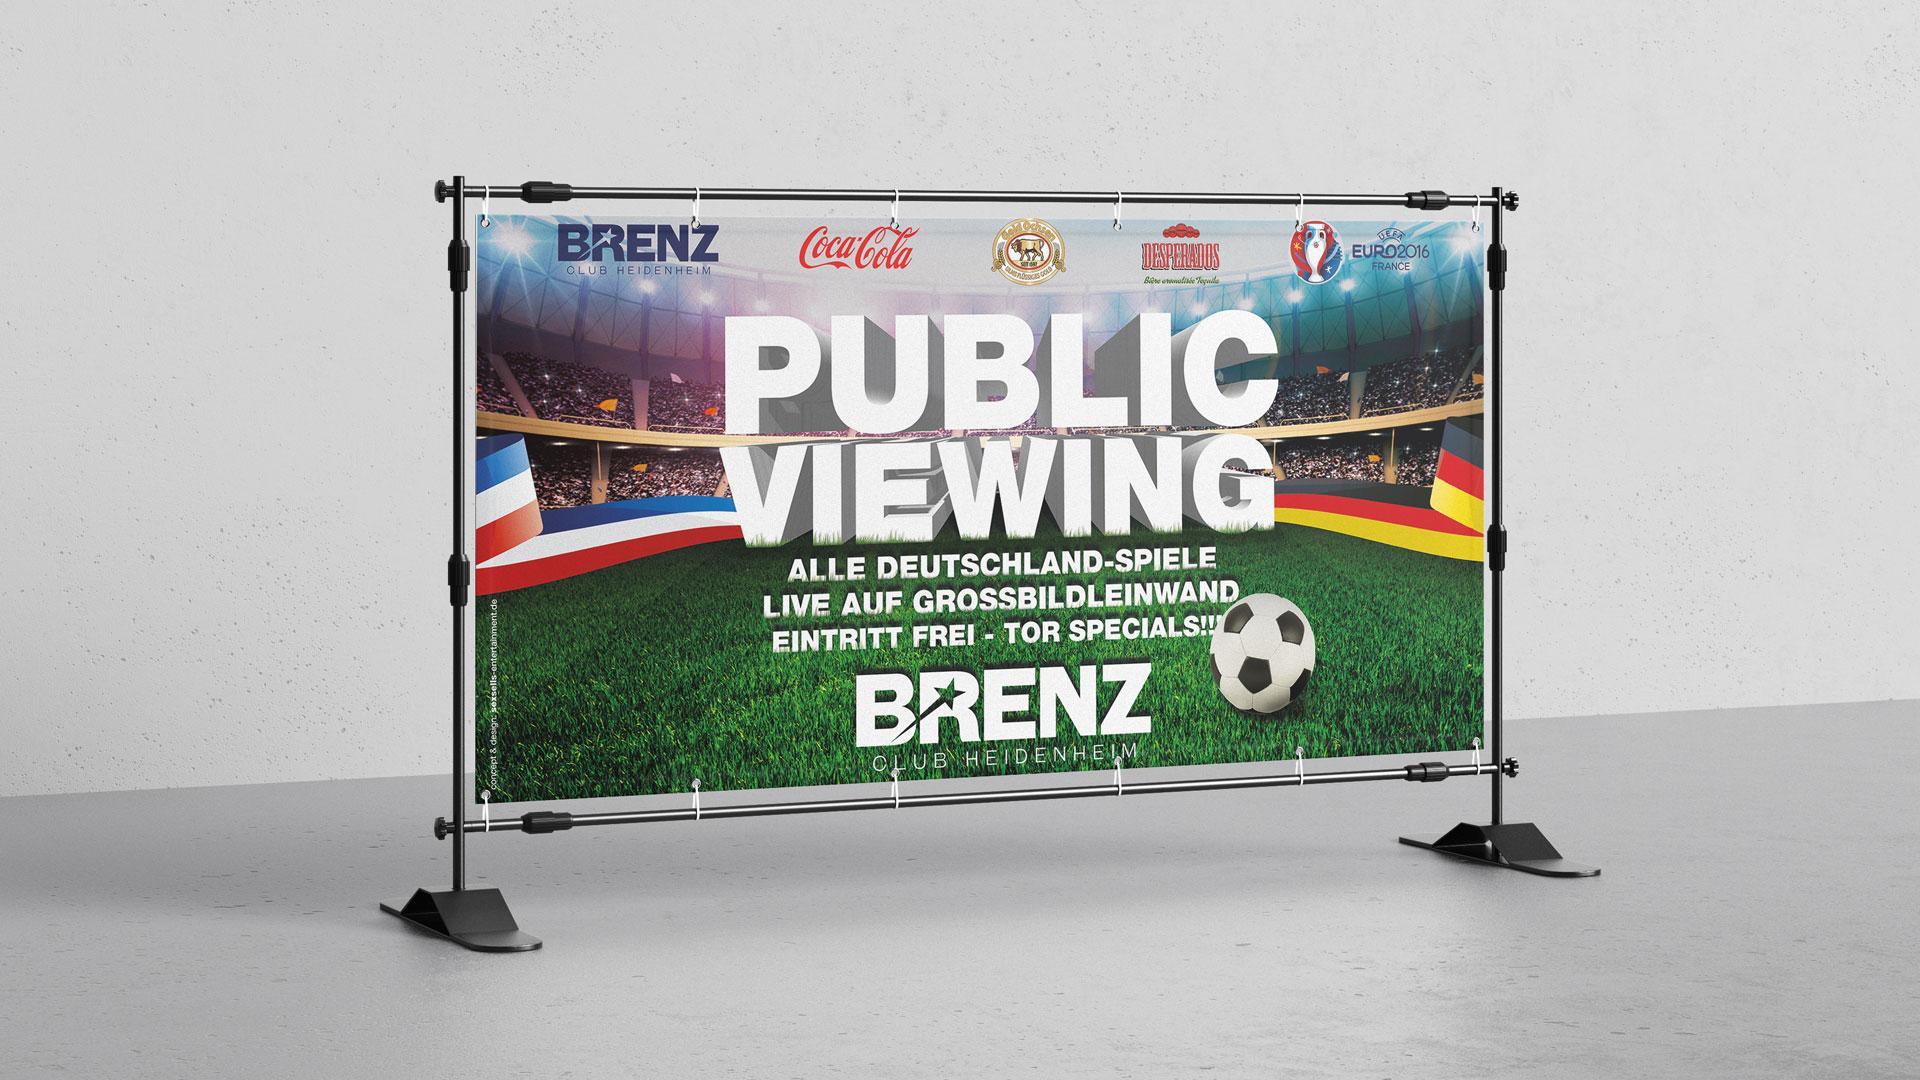 brenz-publicviewing-plane